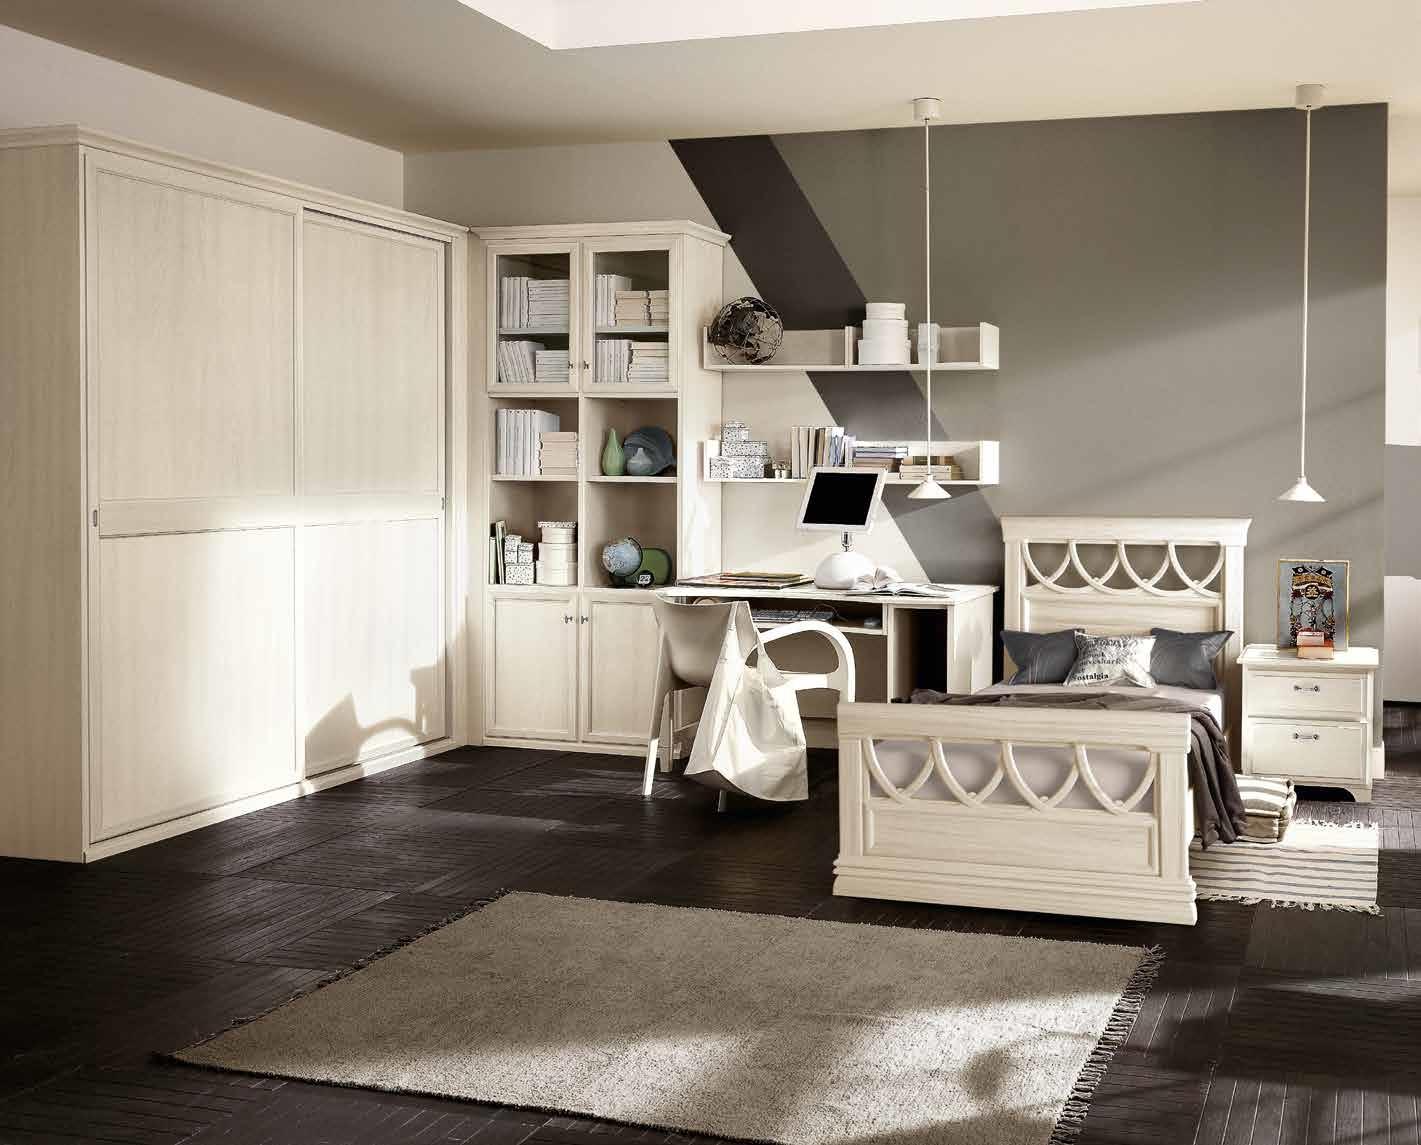 Beautiful Camerette San Michele Contemporary - Home Design Ideas ...